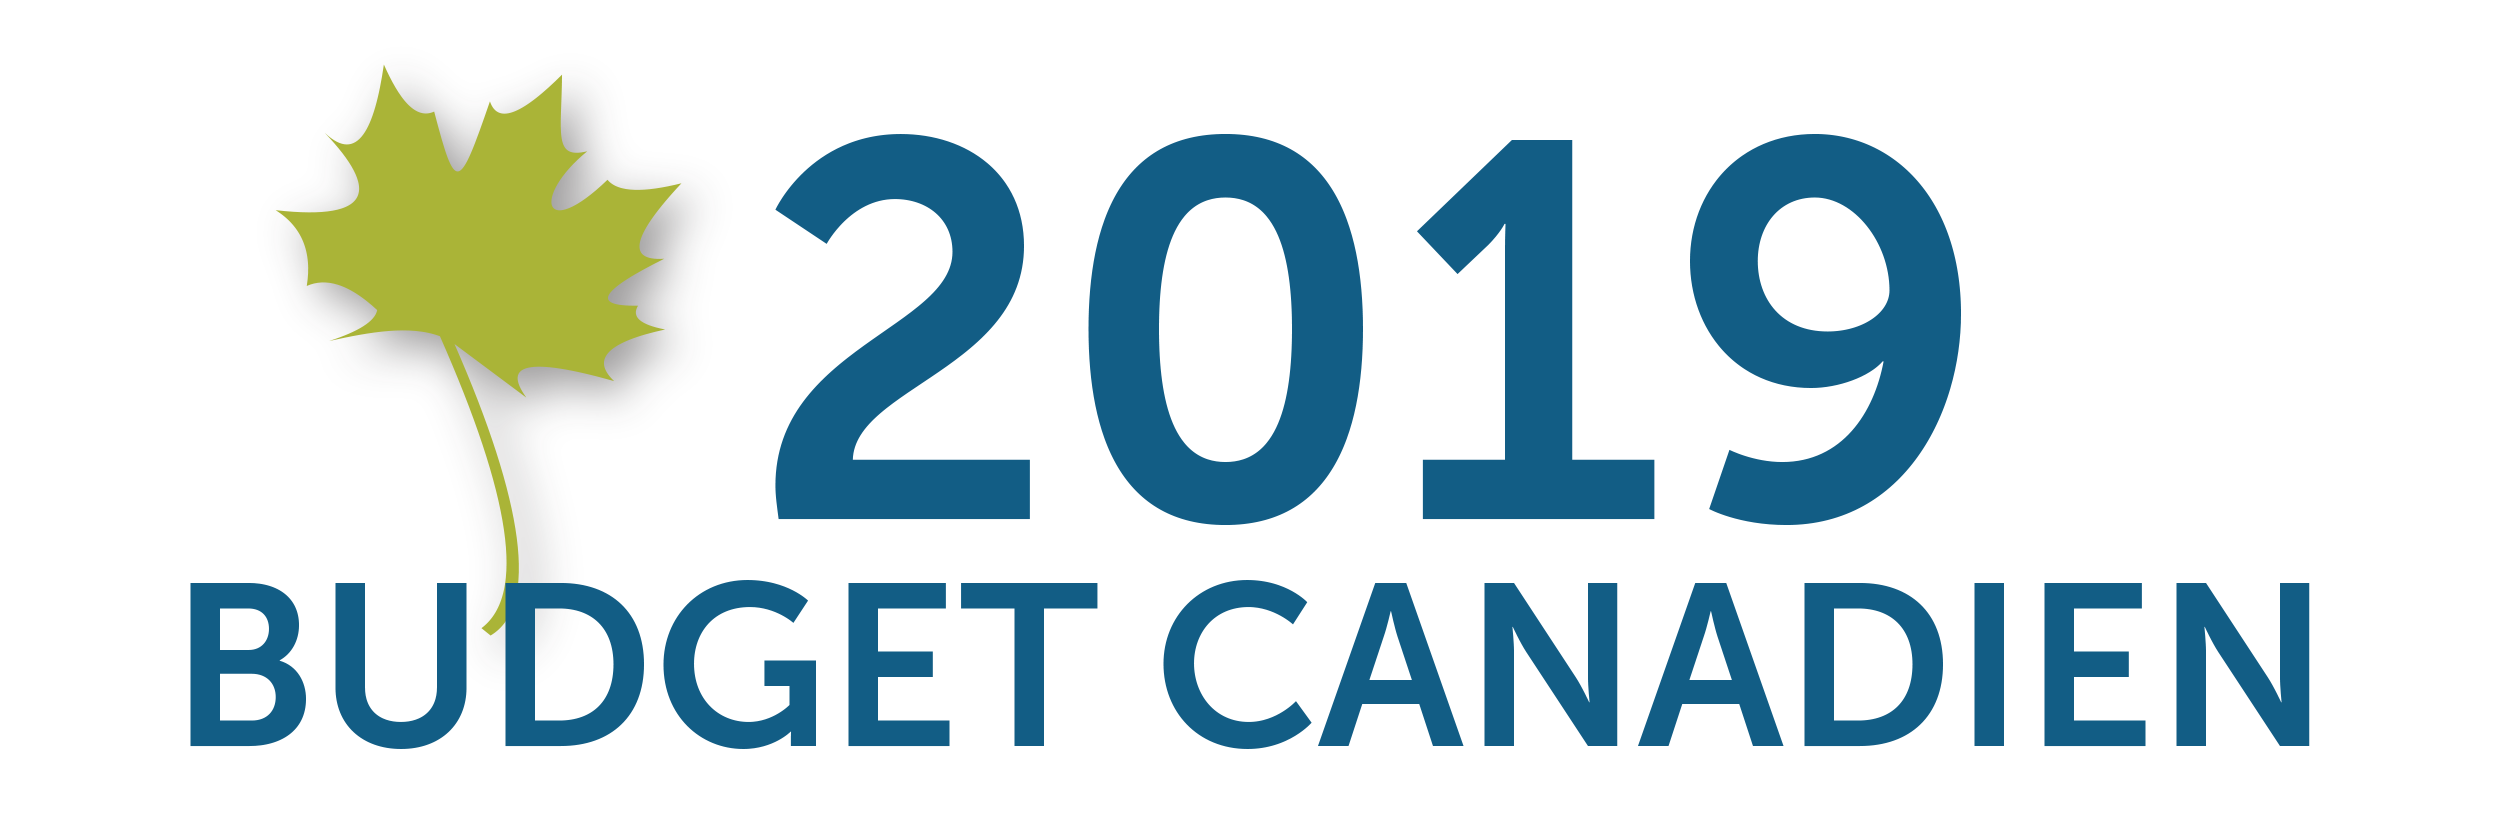 2019Budget Canadien